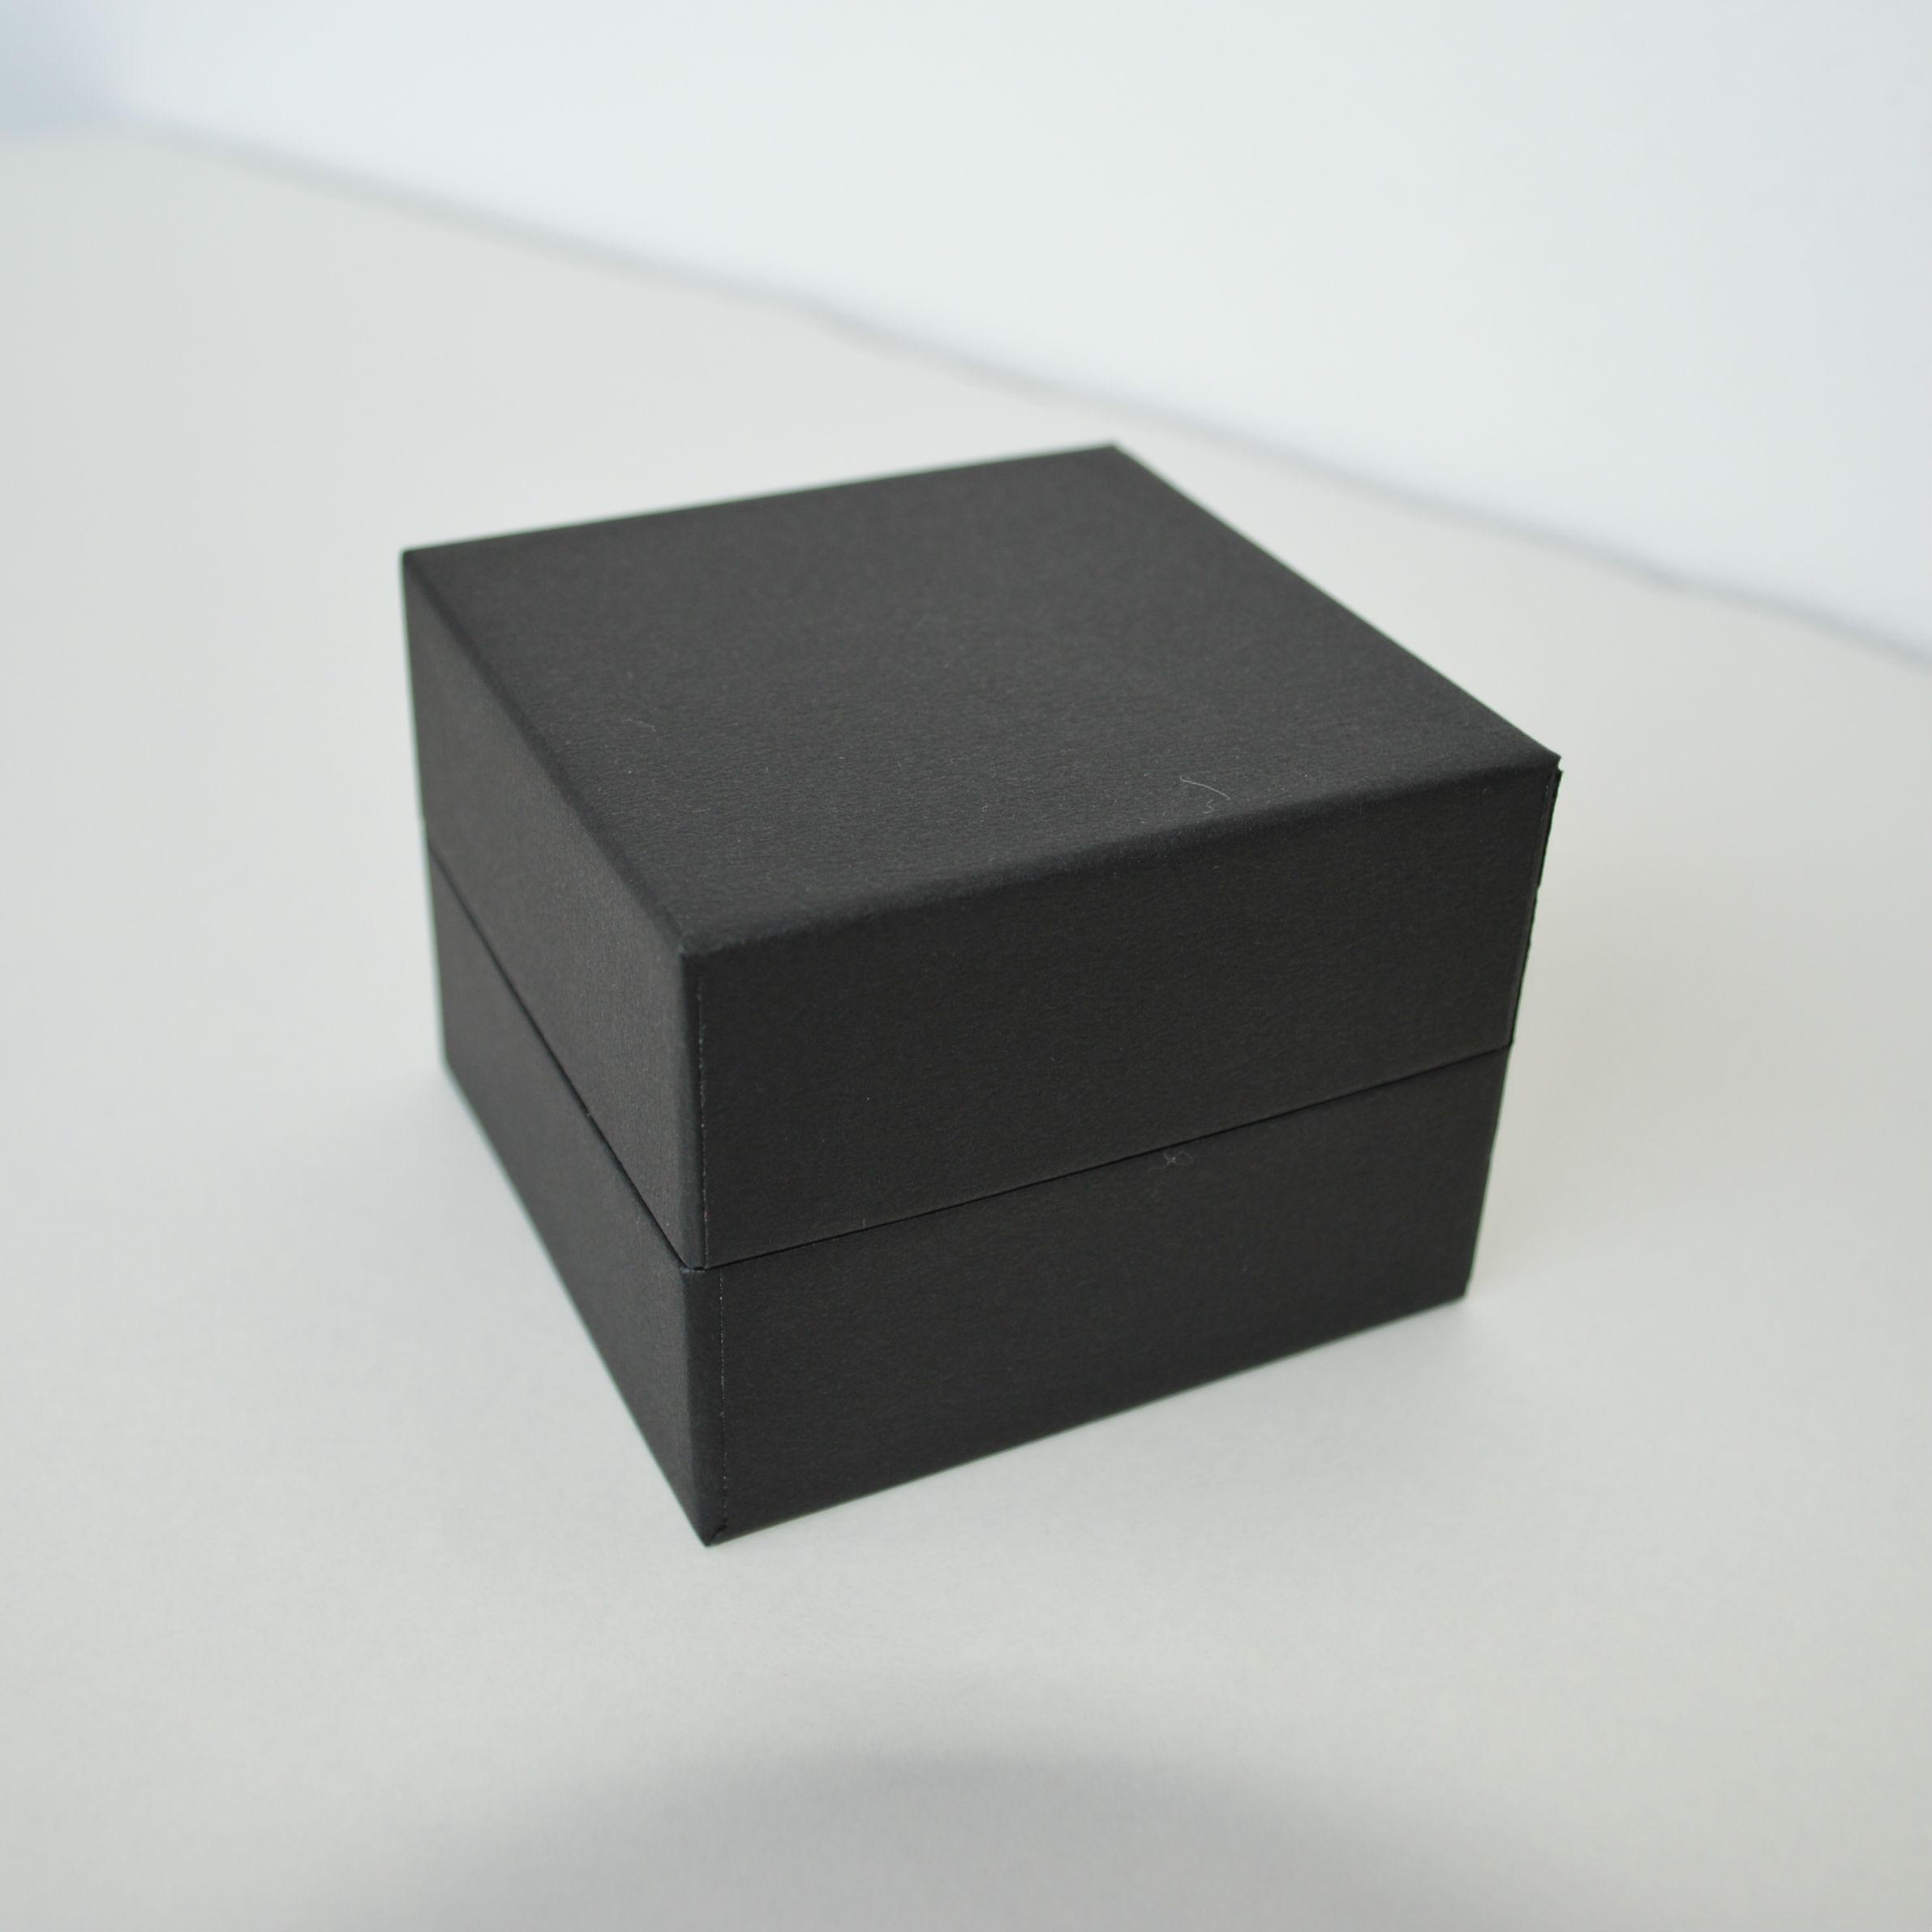 蝶番貼箱3